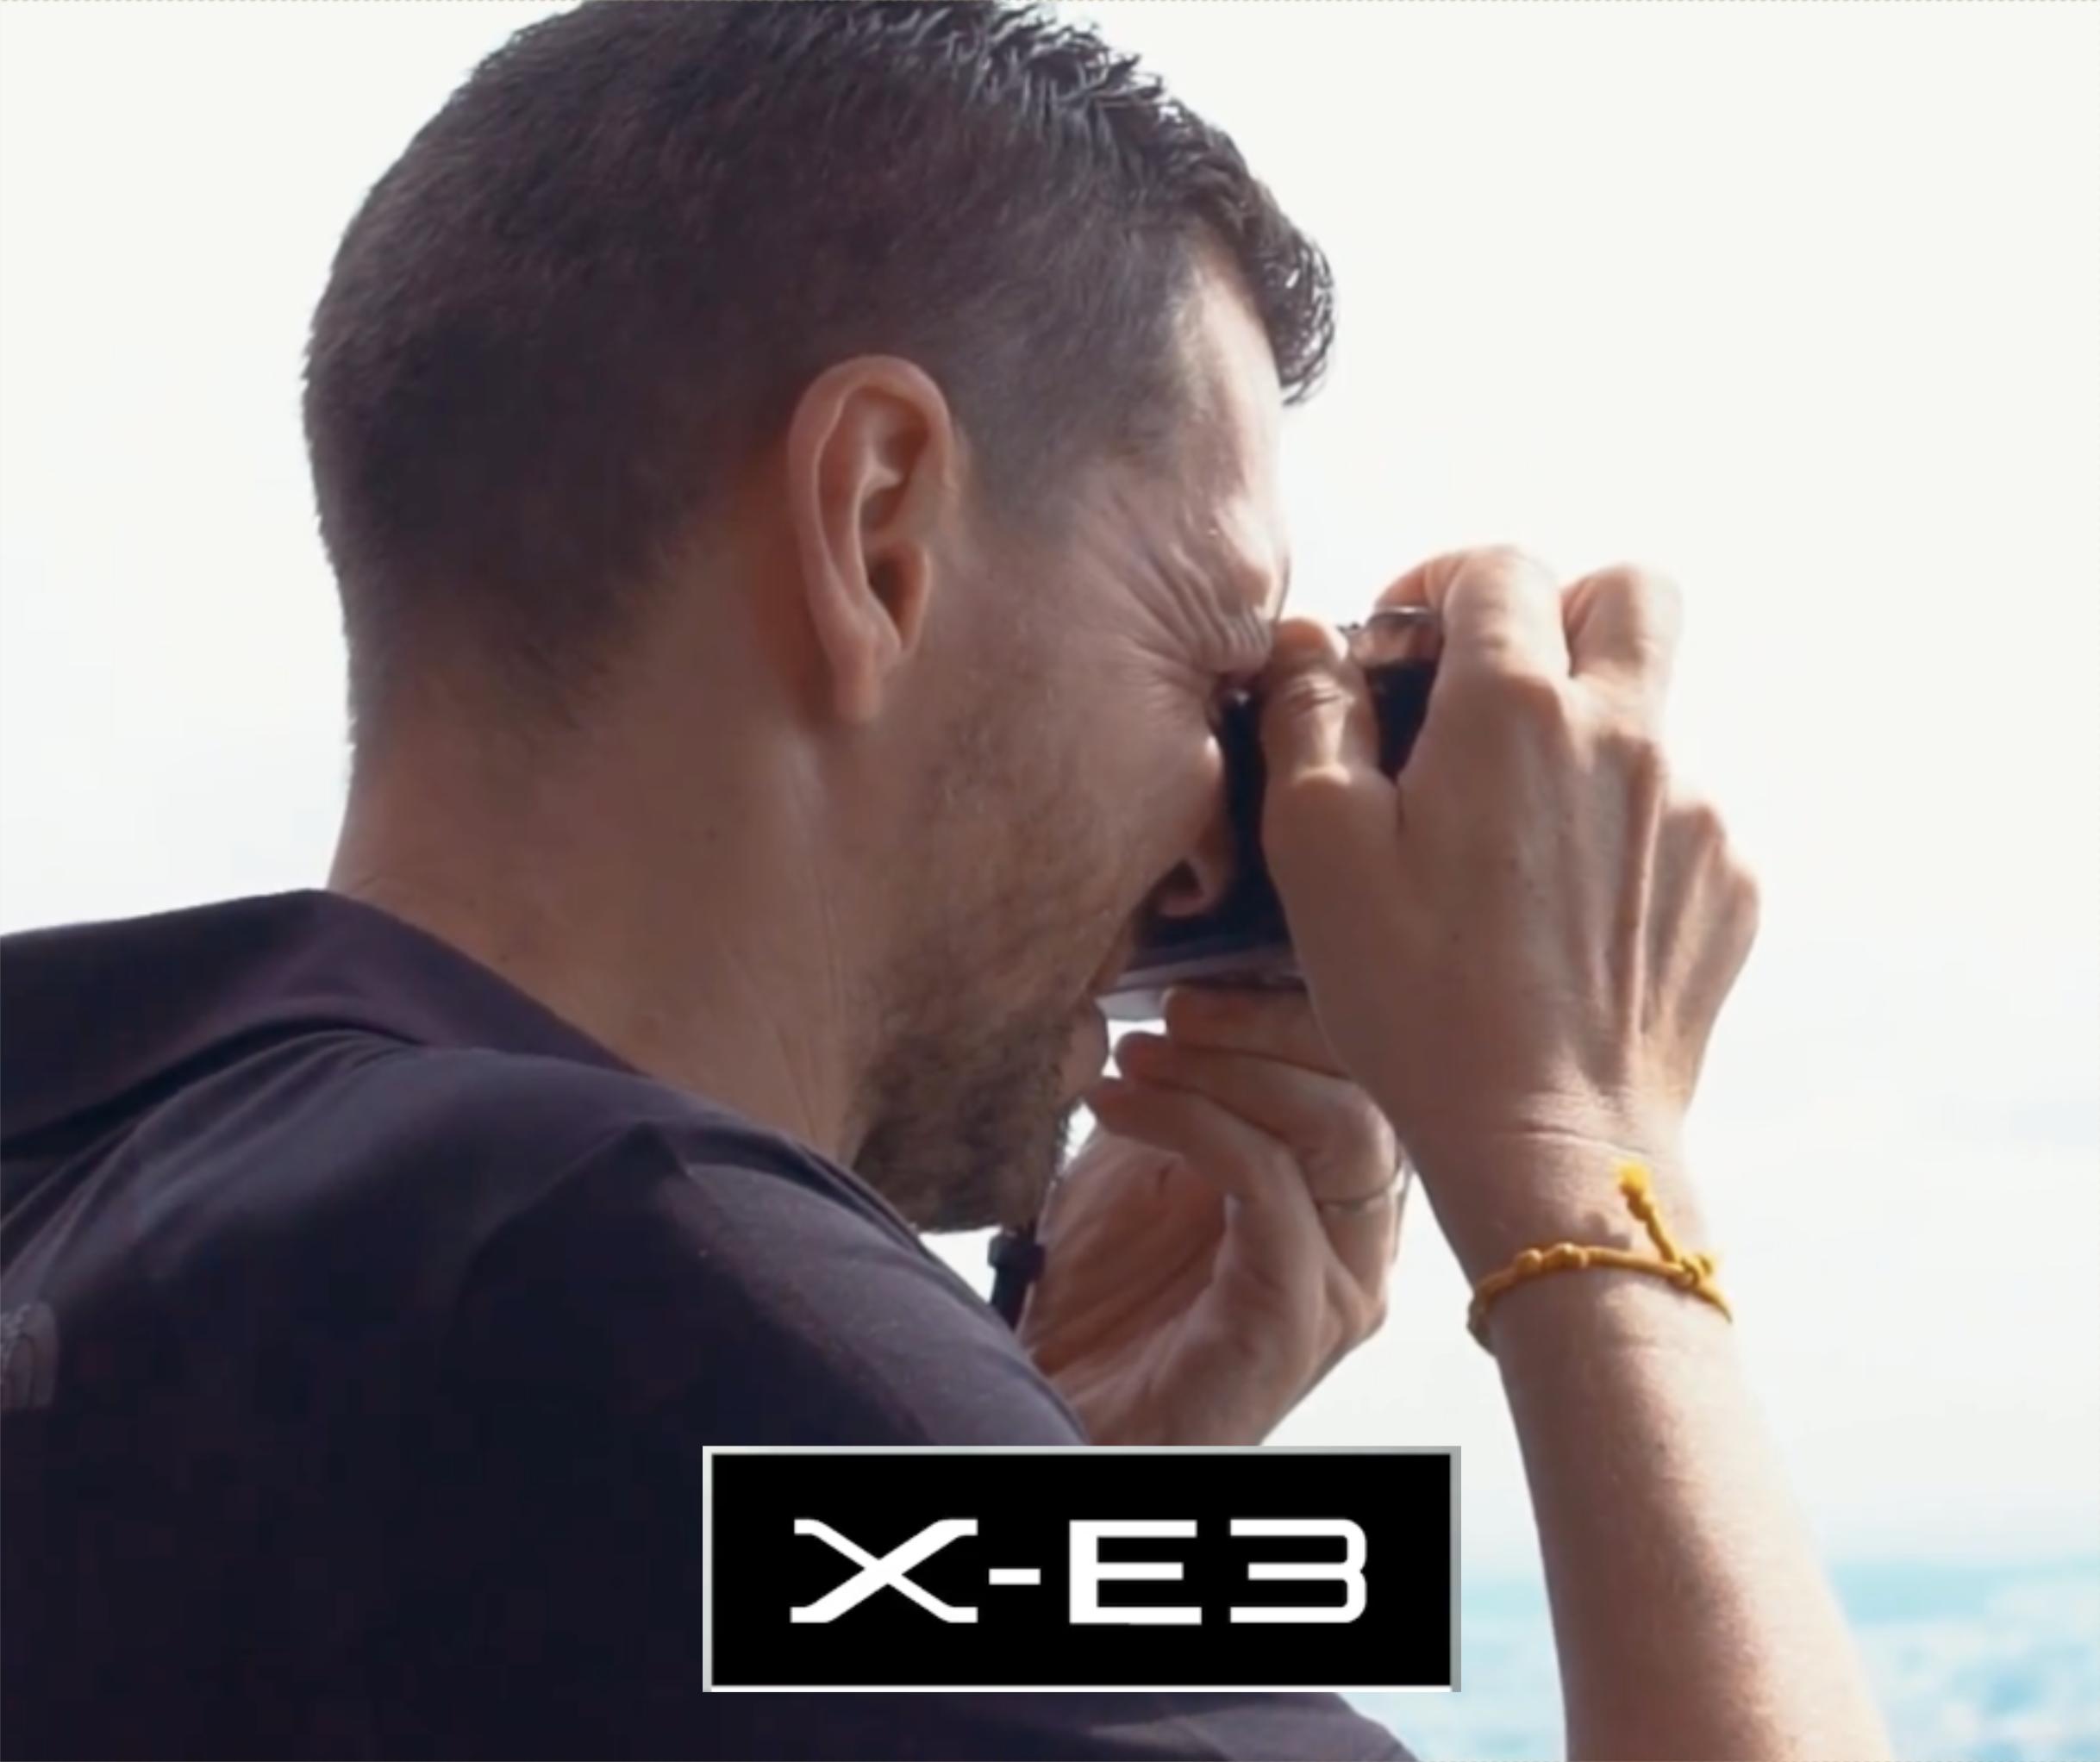 Jose Jeuland - FUJIFILM X-E3 Camera